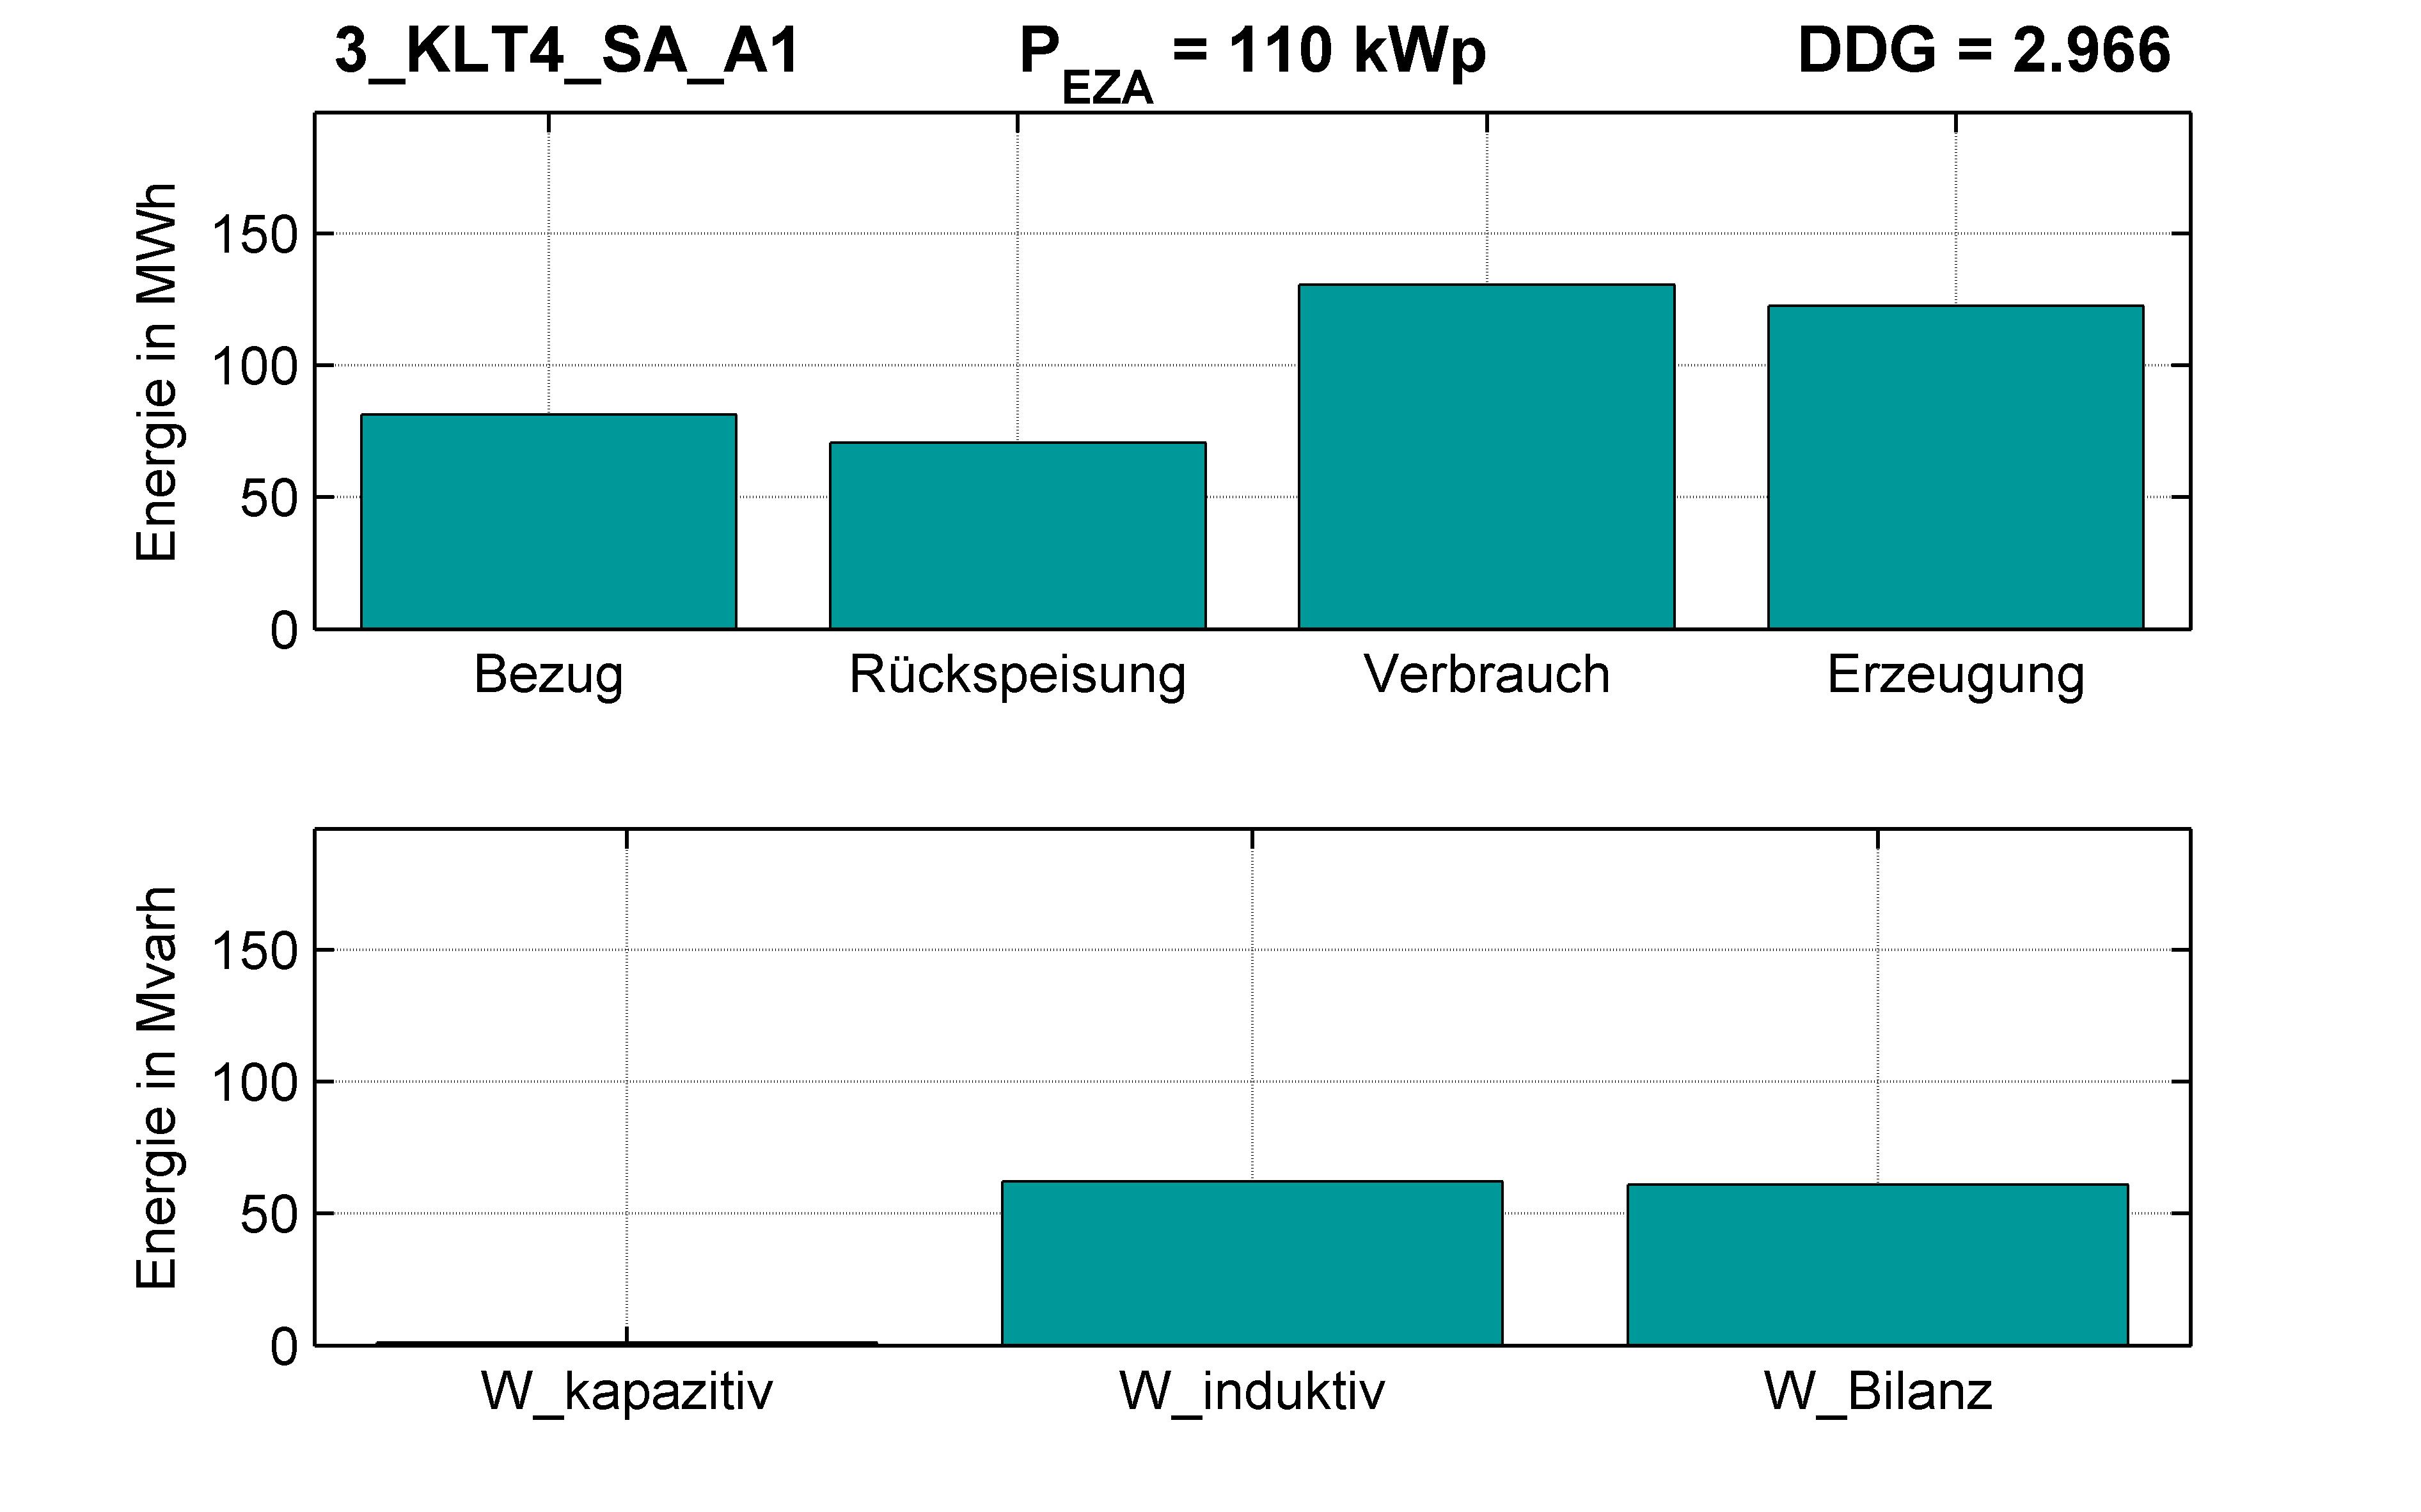 KLT4 | P-Kappung 70% (SA) A1 | PQ-Bilanz